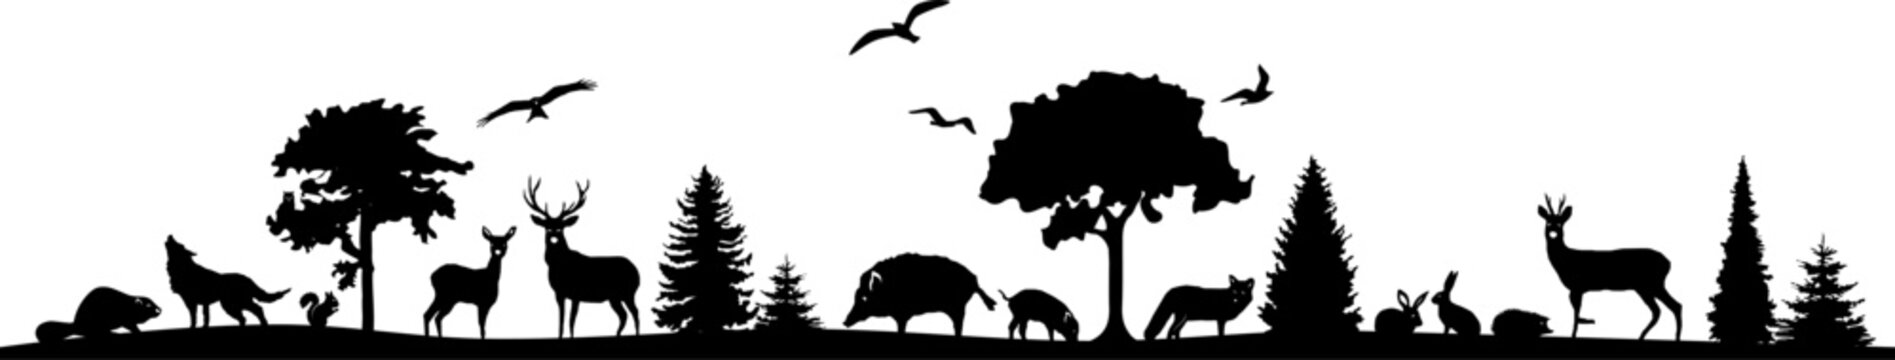 Wild Animals Forest Landscape Vector Silhouette